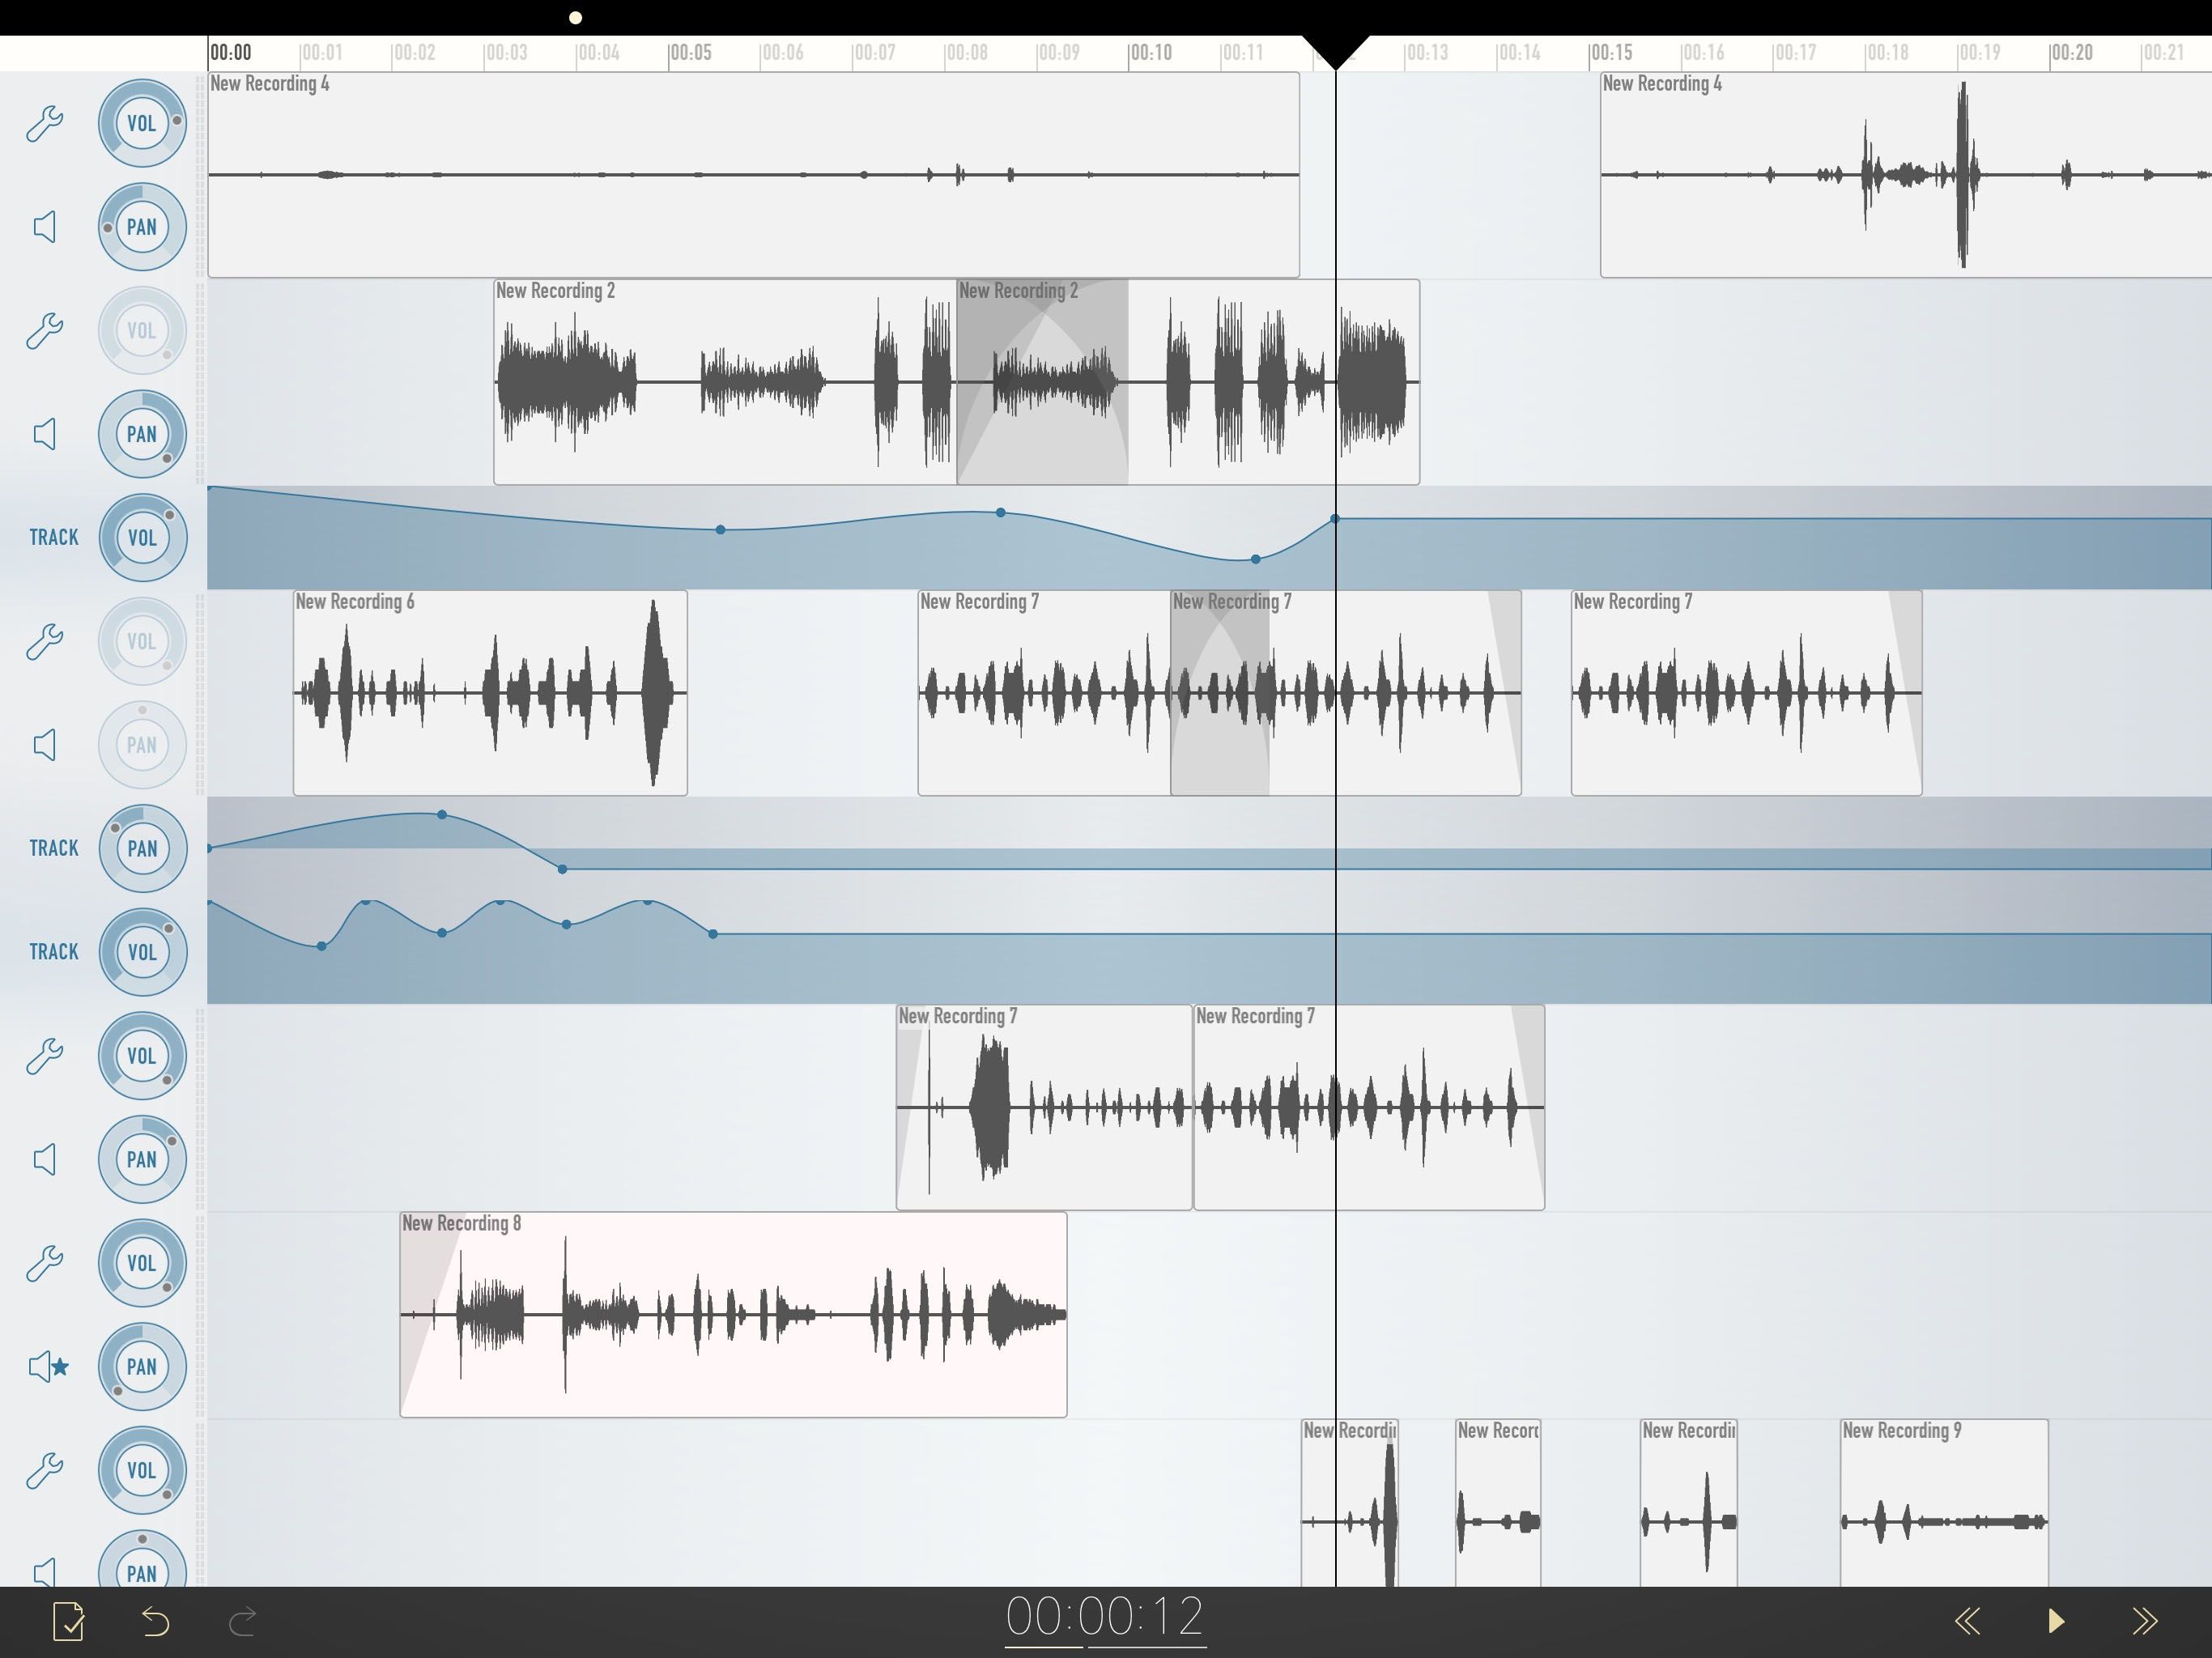 Pin by Mars Saxman on music visualization and manipulation